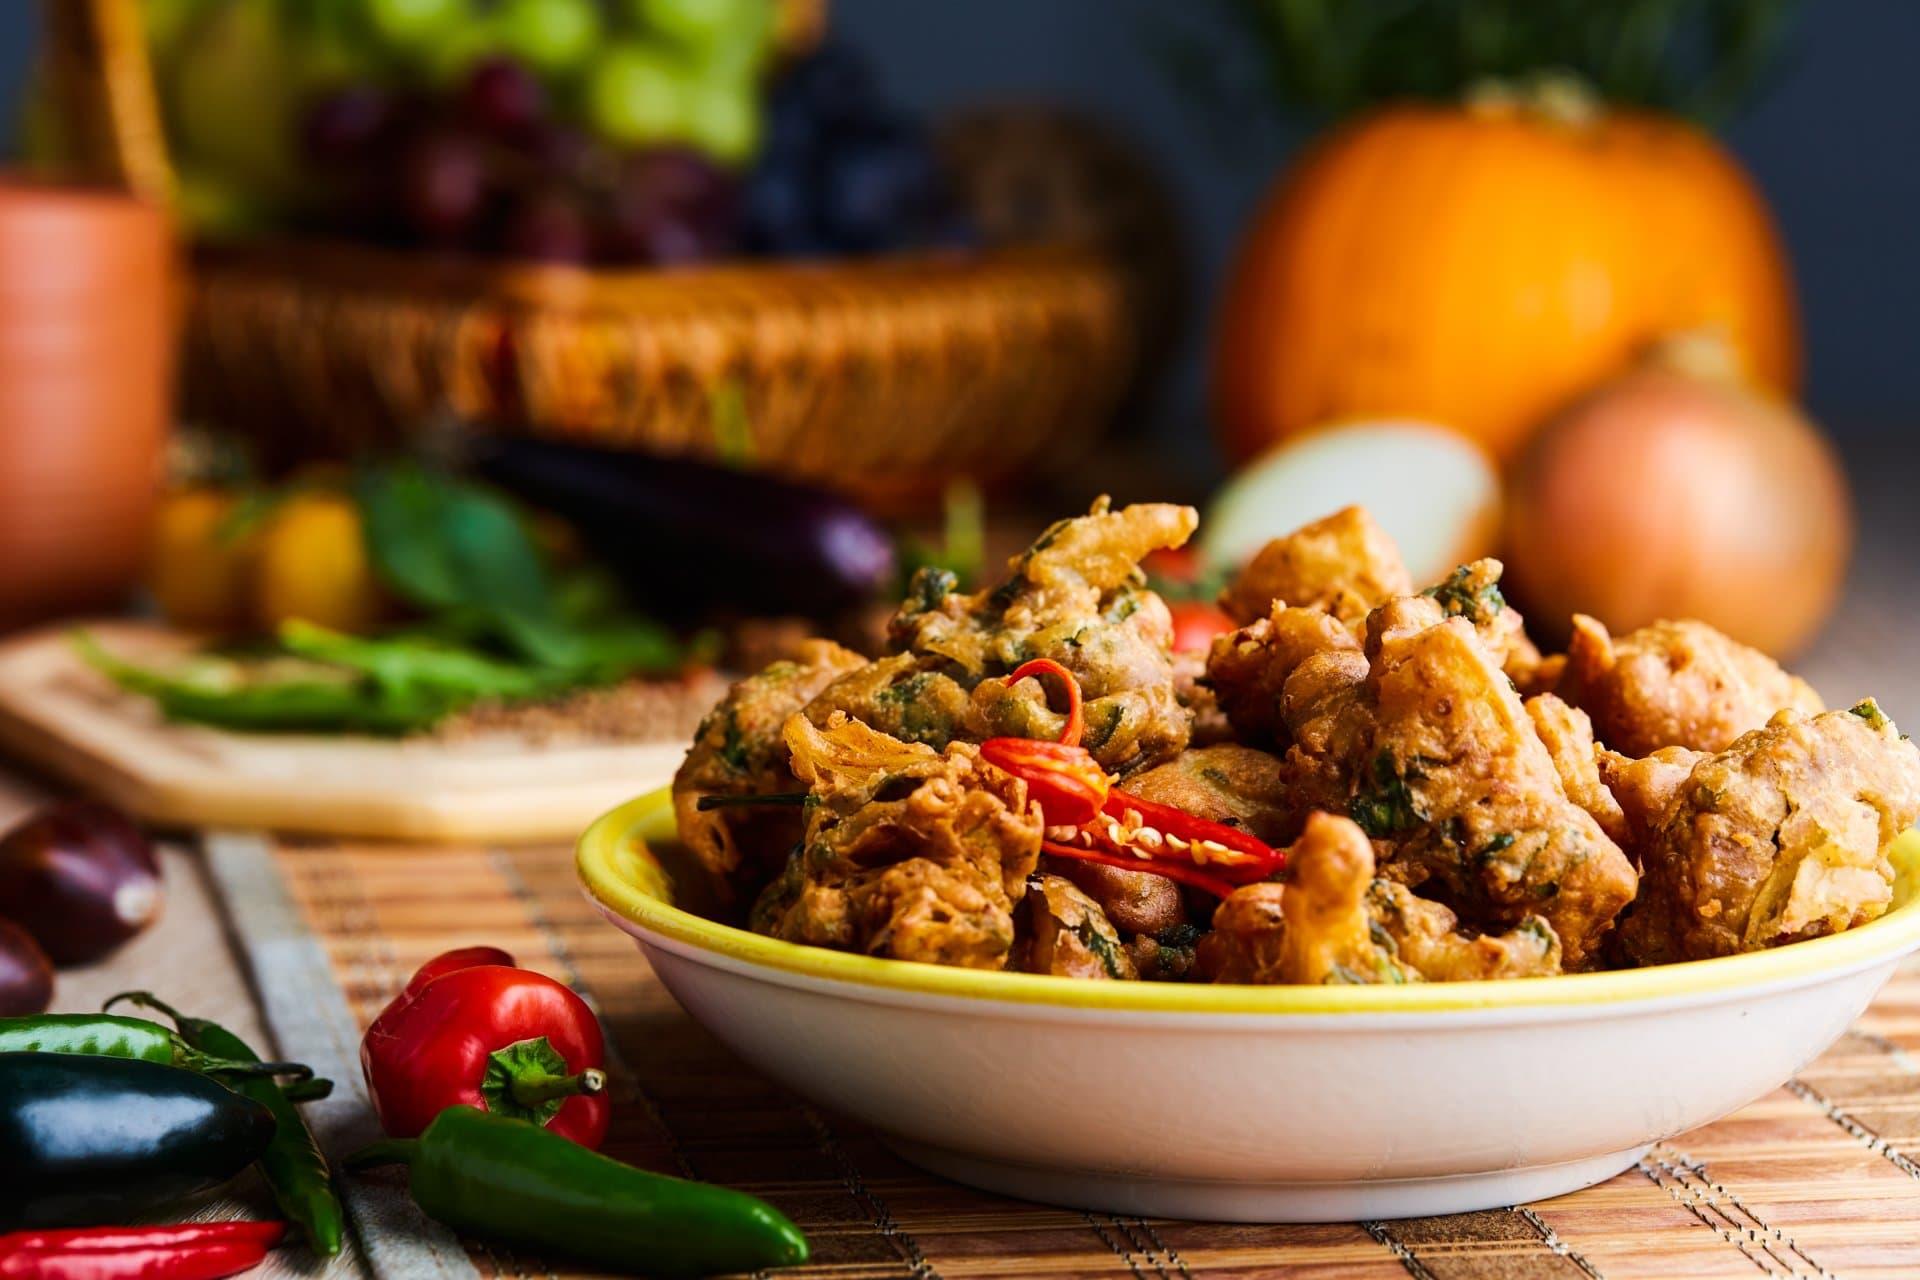 Afias Spicy Vegetable Pakora WGF 2020 2596